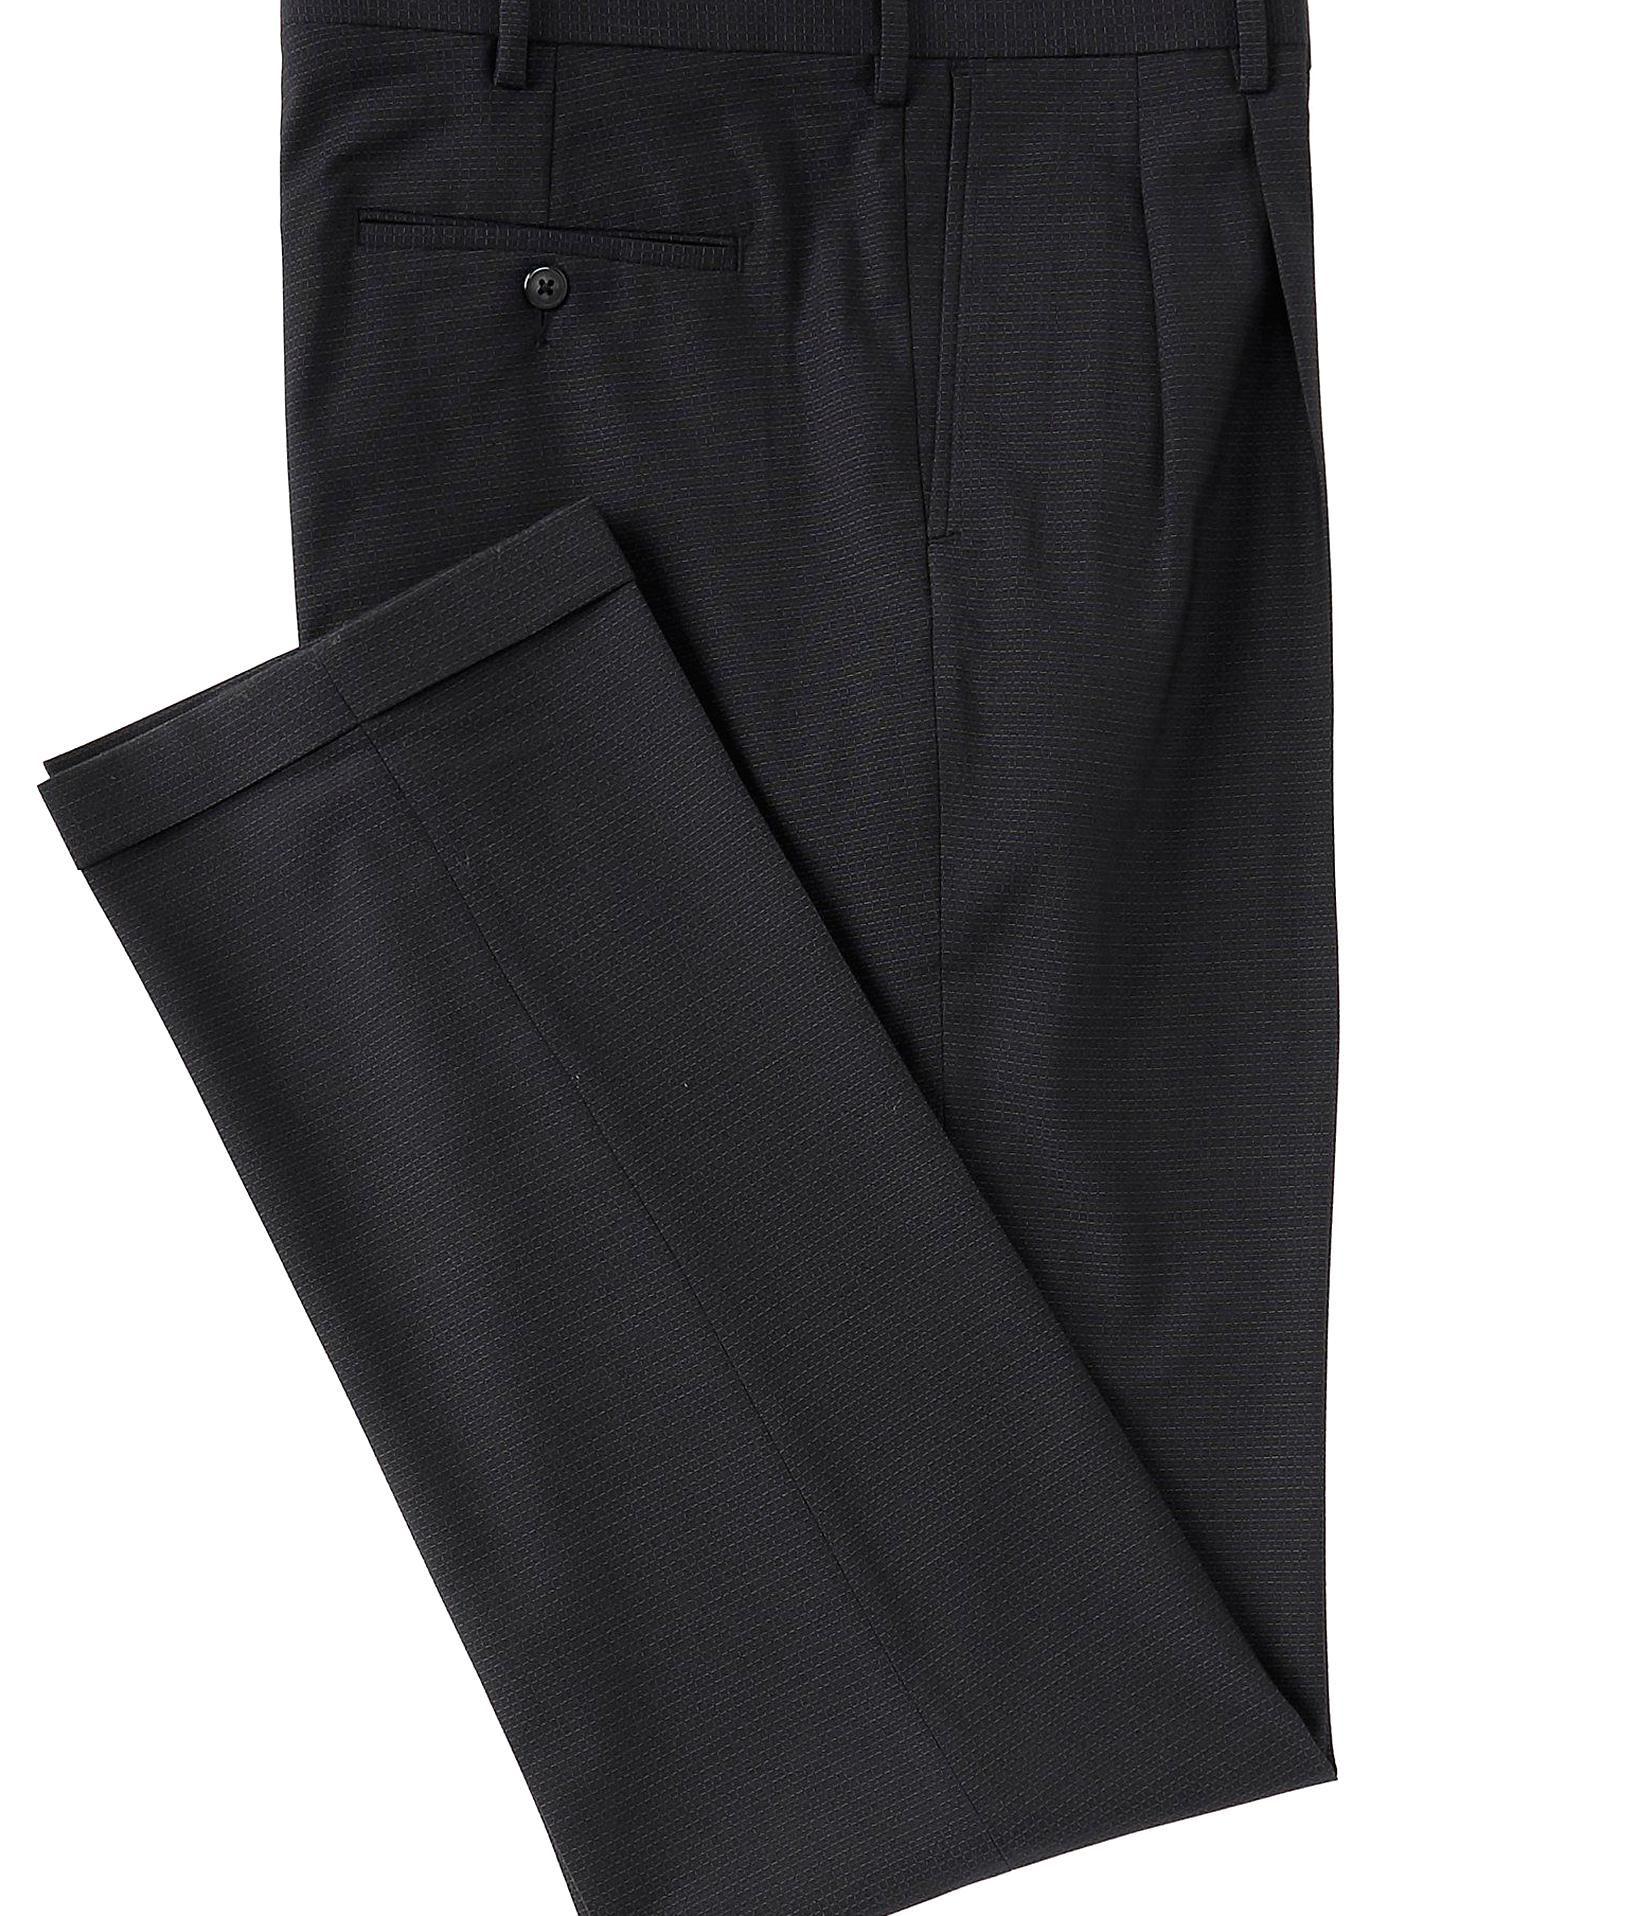 Roundtree Yorke Big Tall Travelsmart Pleated Plaid Dress Pants Black 38 36 In 2020 Plaid Dress Pants Plaid Dress Black Pants [ 1916 x 1636 Pixel ]